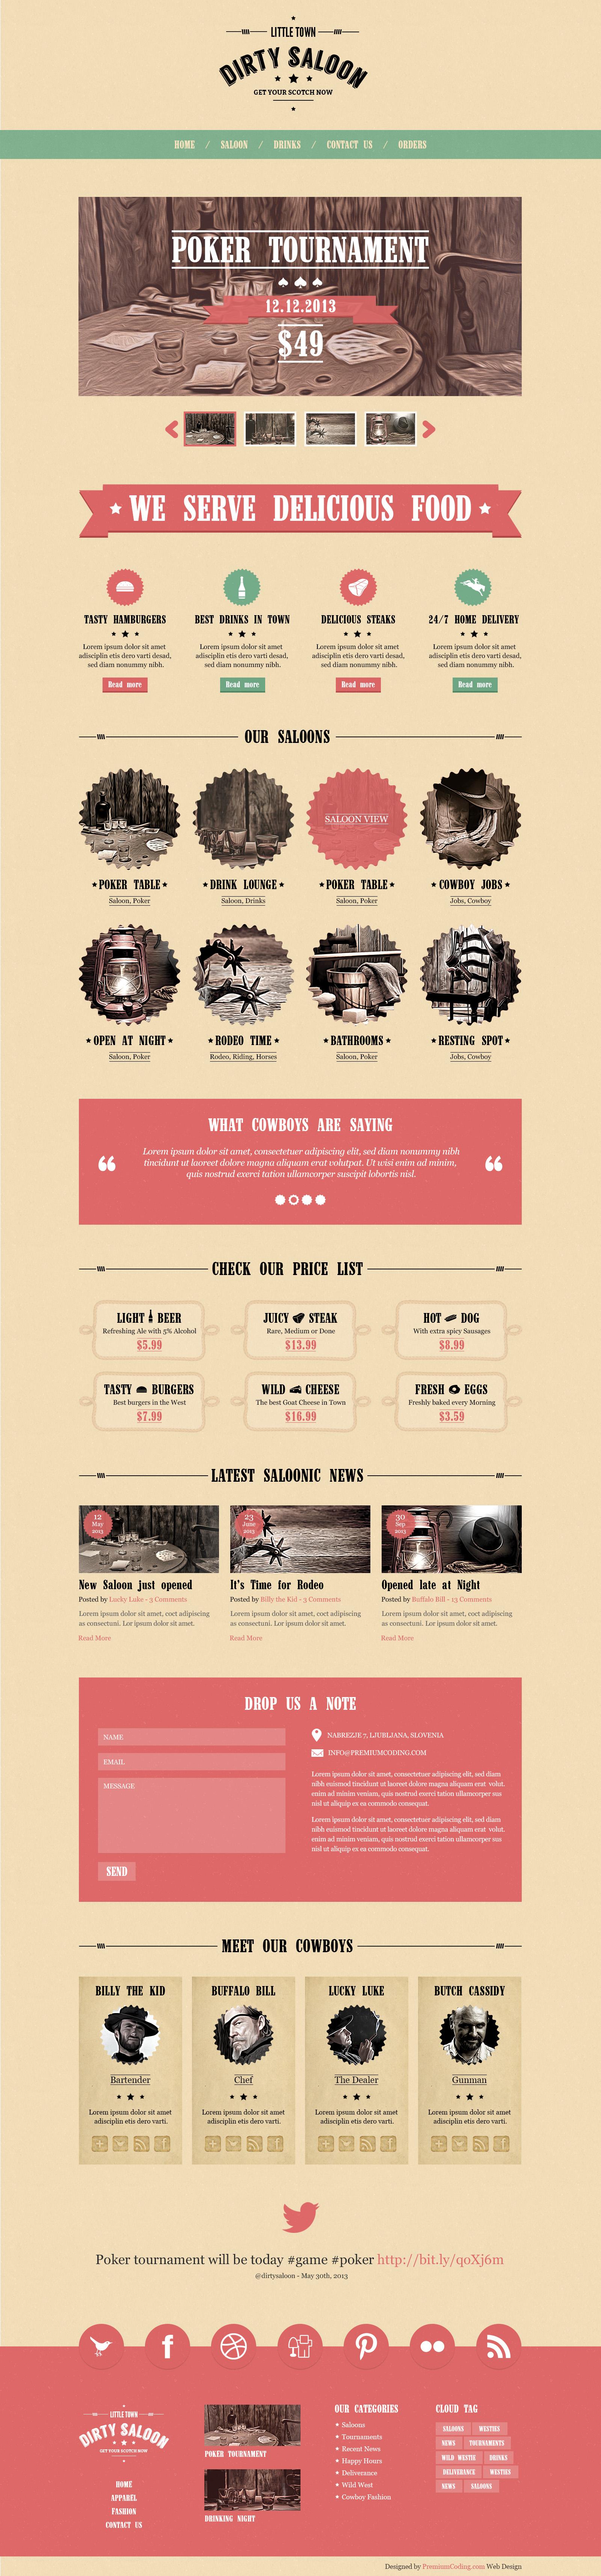 02_cowboy-home-page-1-font